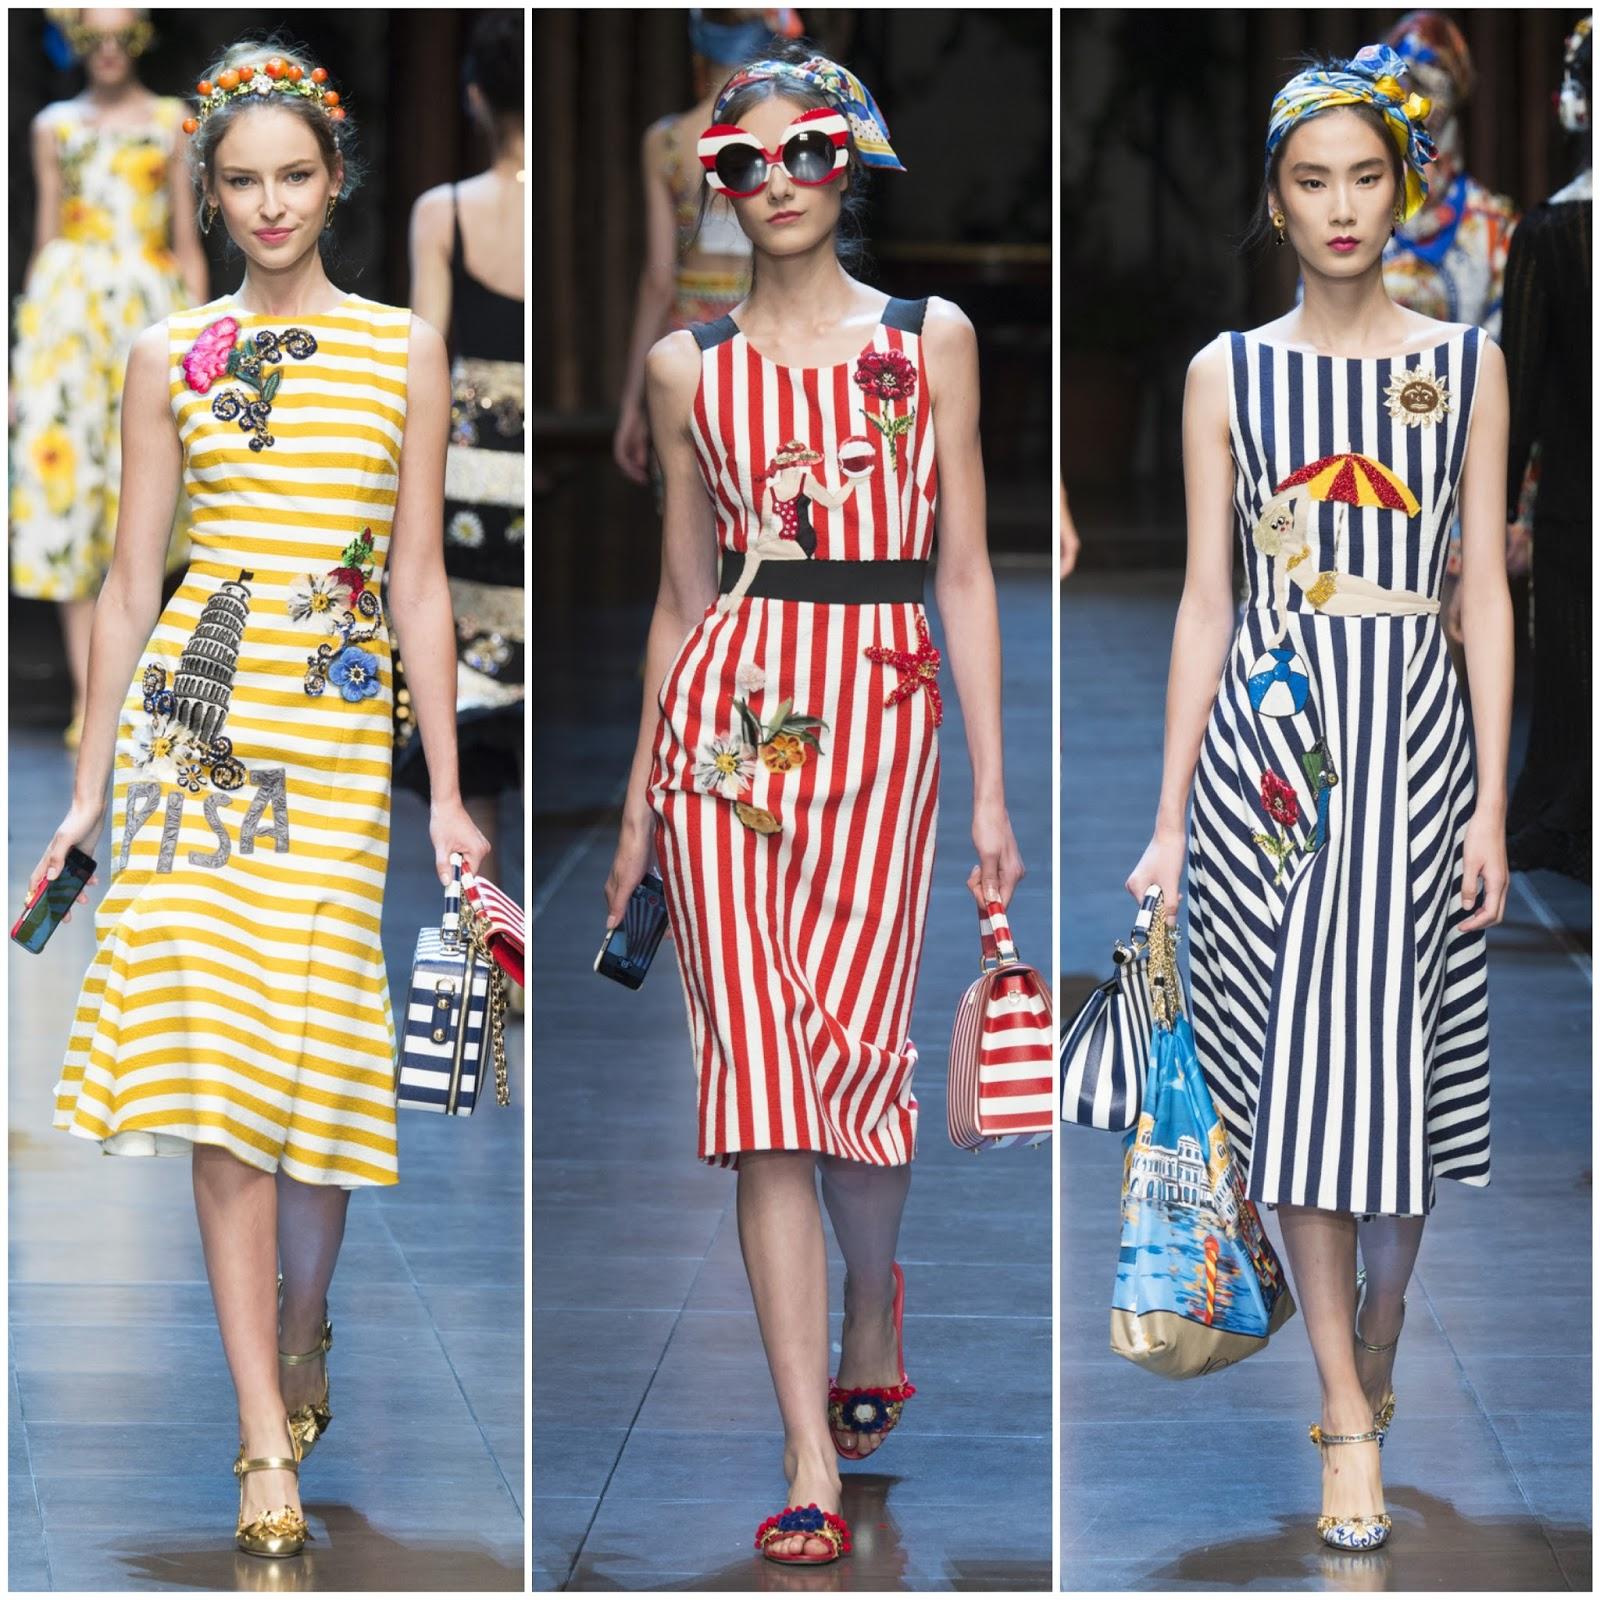 Striped Slip On Spring/summer Dolce & Gabbana N8gqz